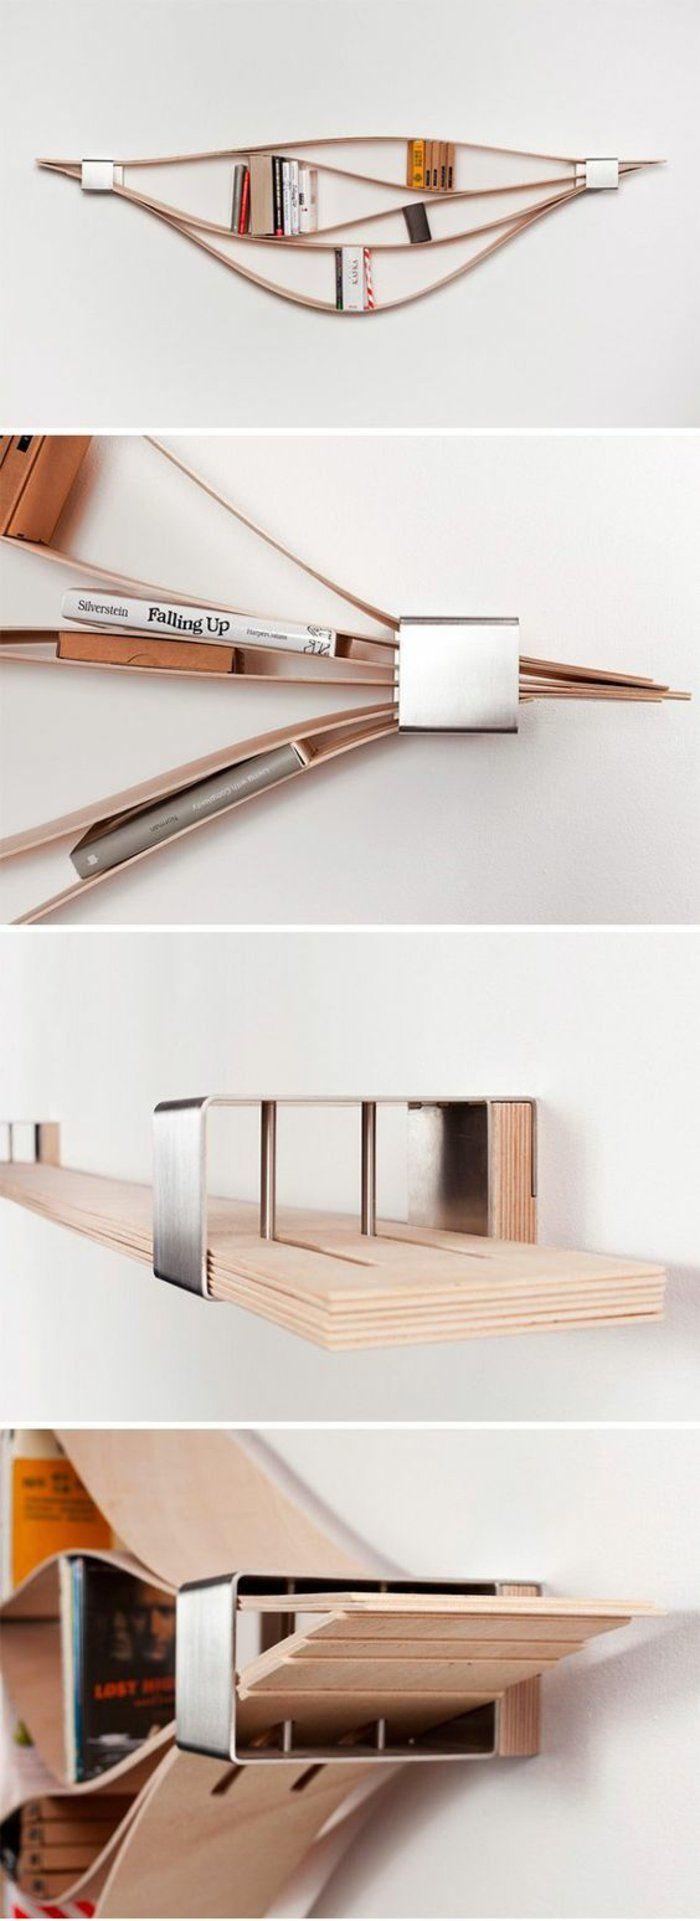 b cherregal diy swalif. Black Bedroom Furniture Sets. Home Design Ideas